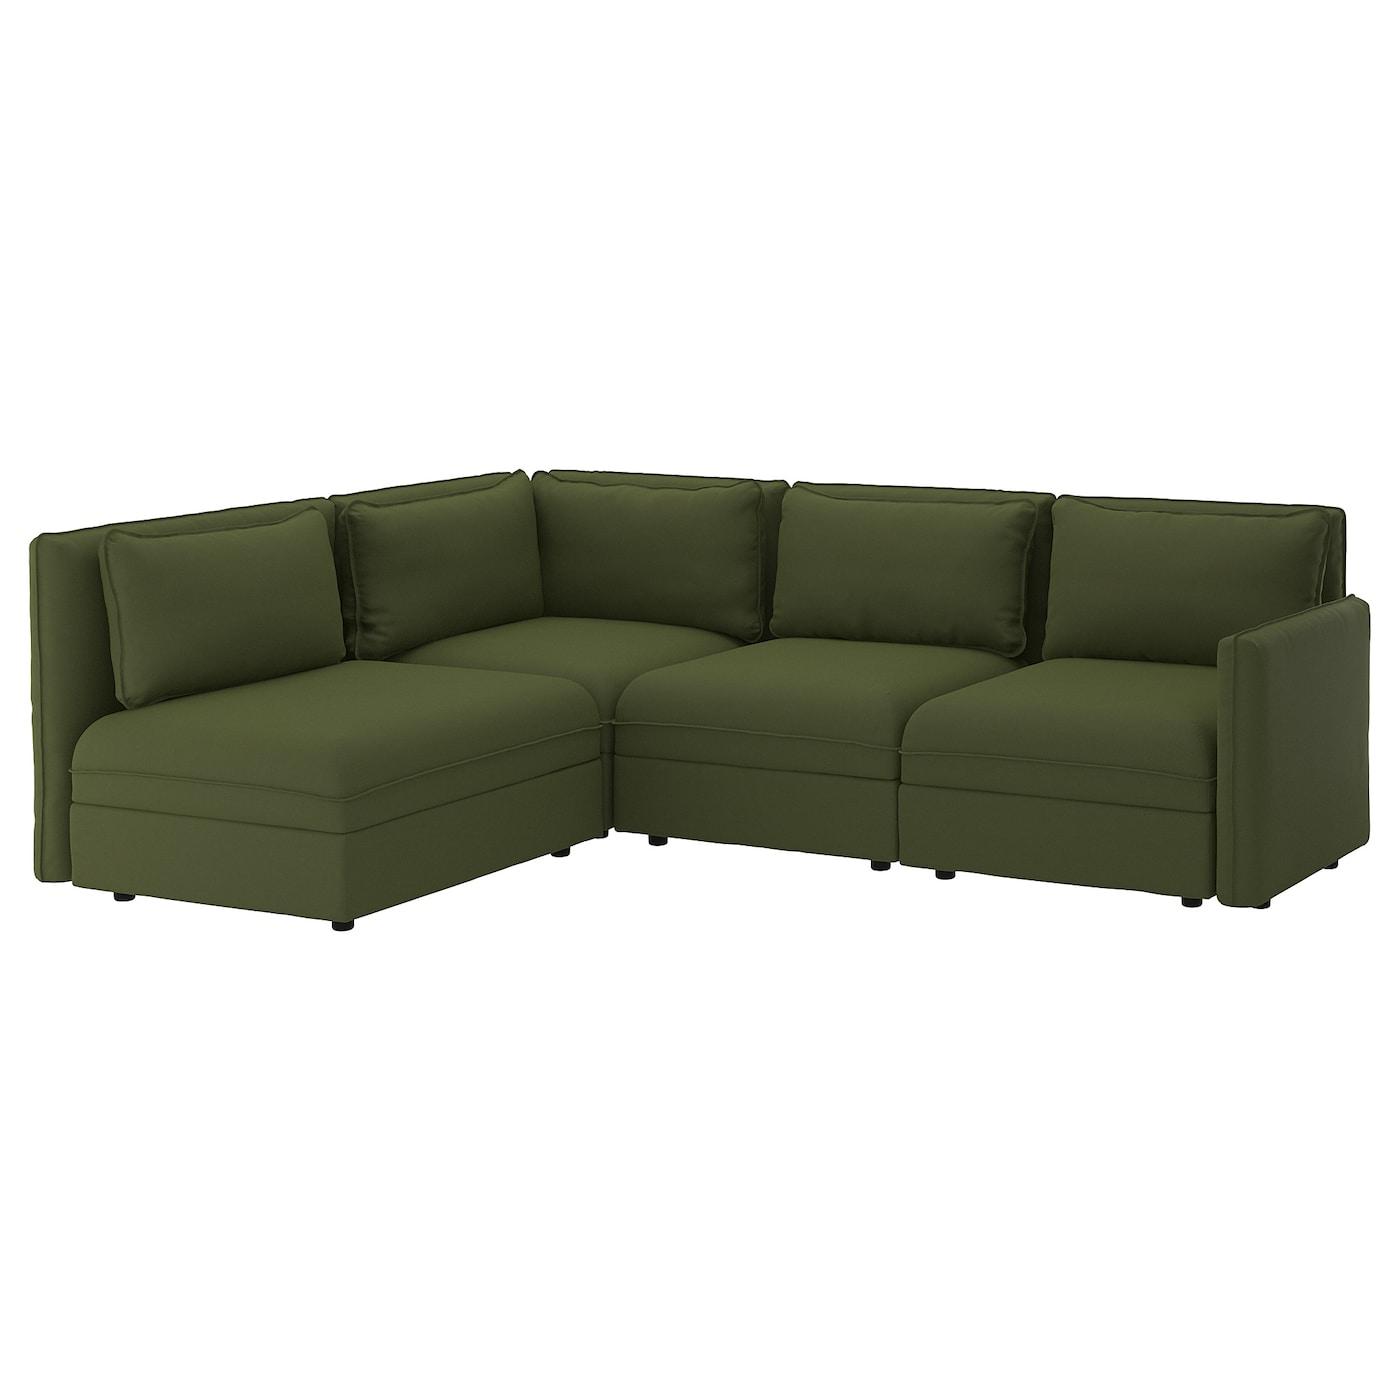 Vallentuna With Storage/Ramna Olive Green, Modular Corner In Modular Corner Sofas (View 4 of 15)